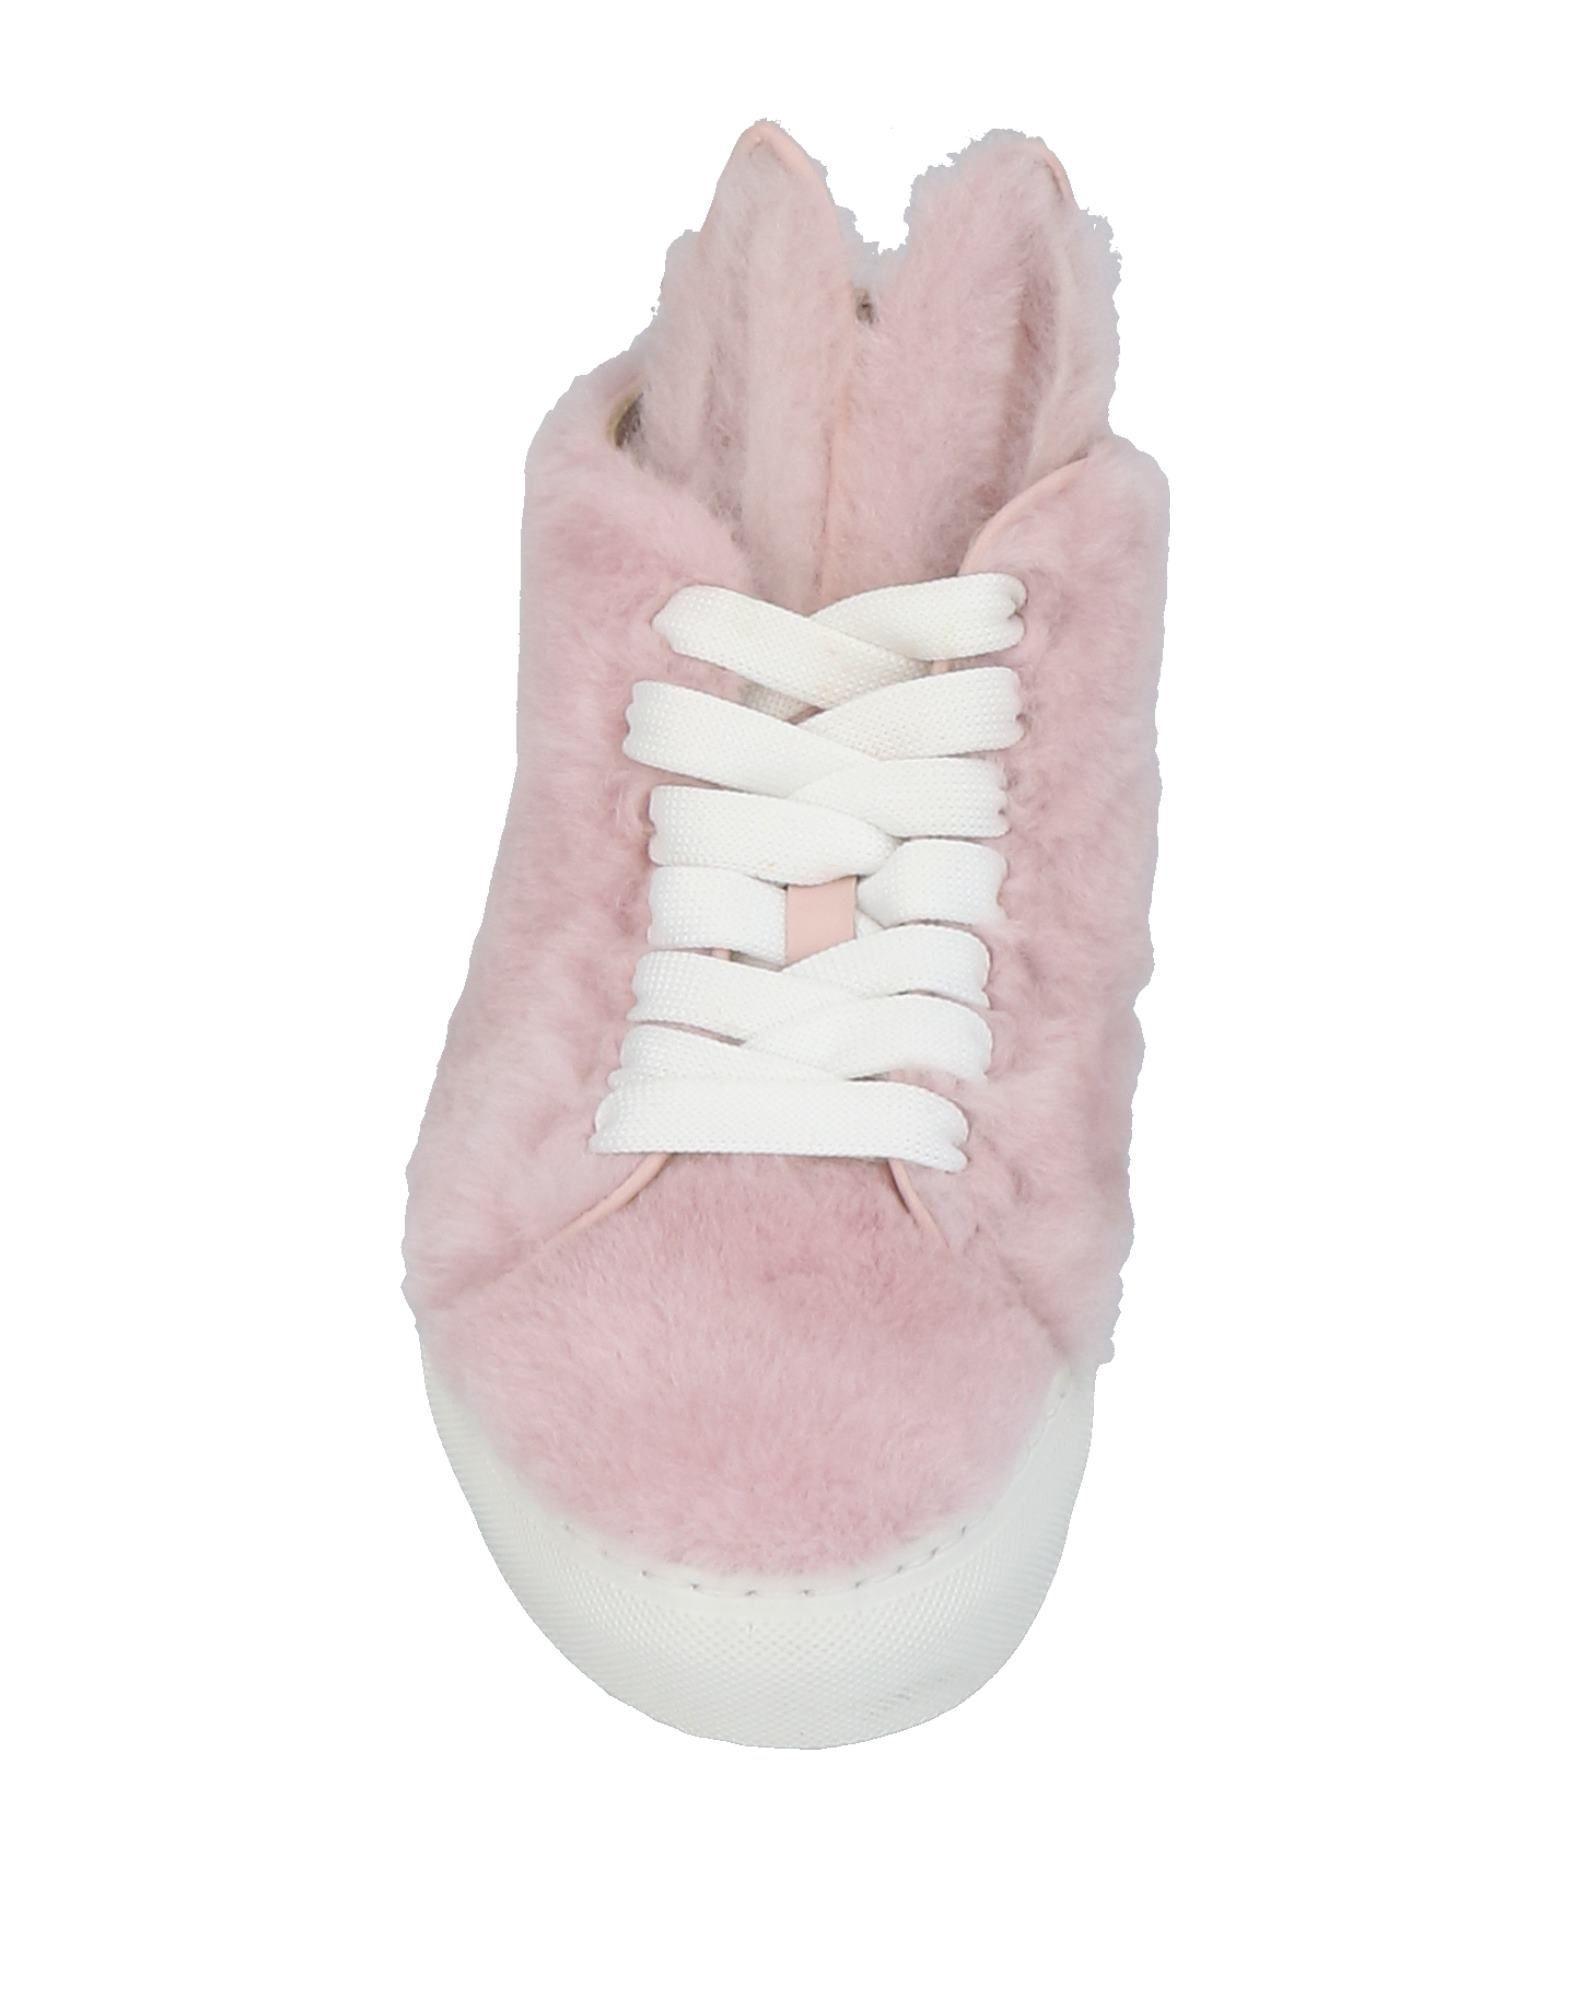 Minna Parikka Leather High-tops & Sneakers in Light Pink (Pink)